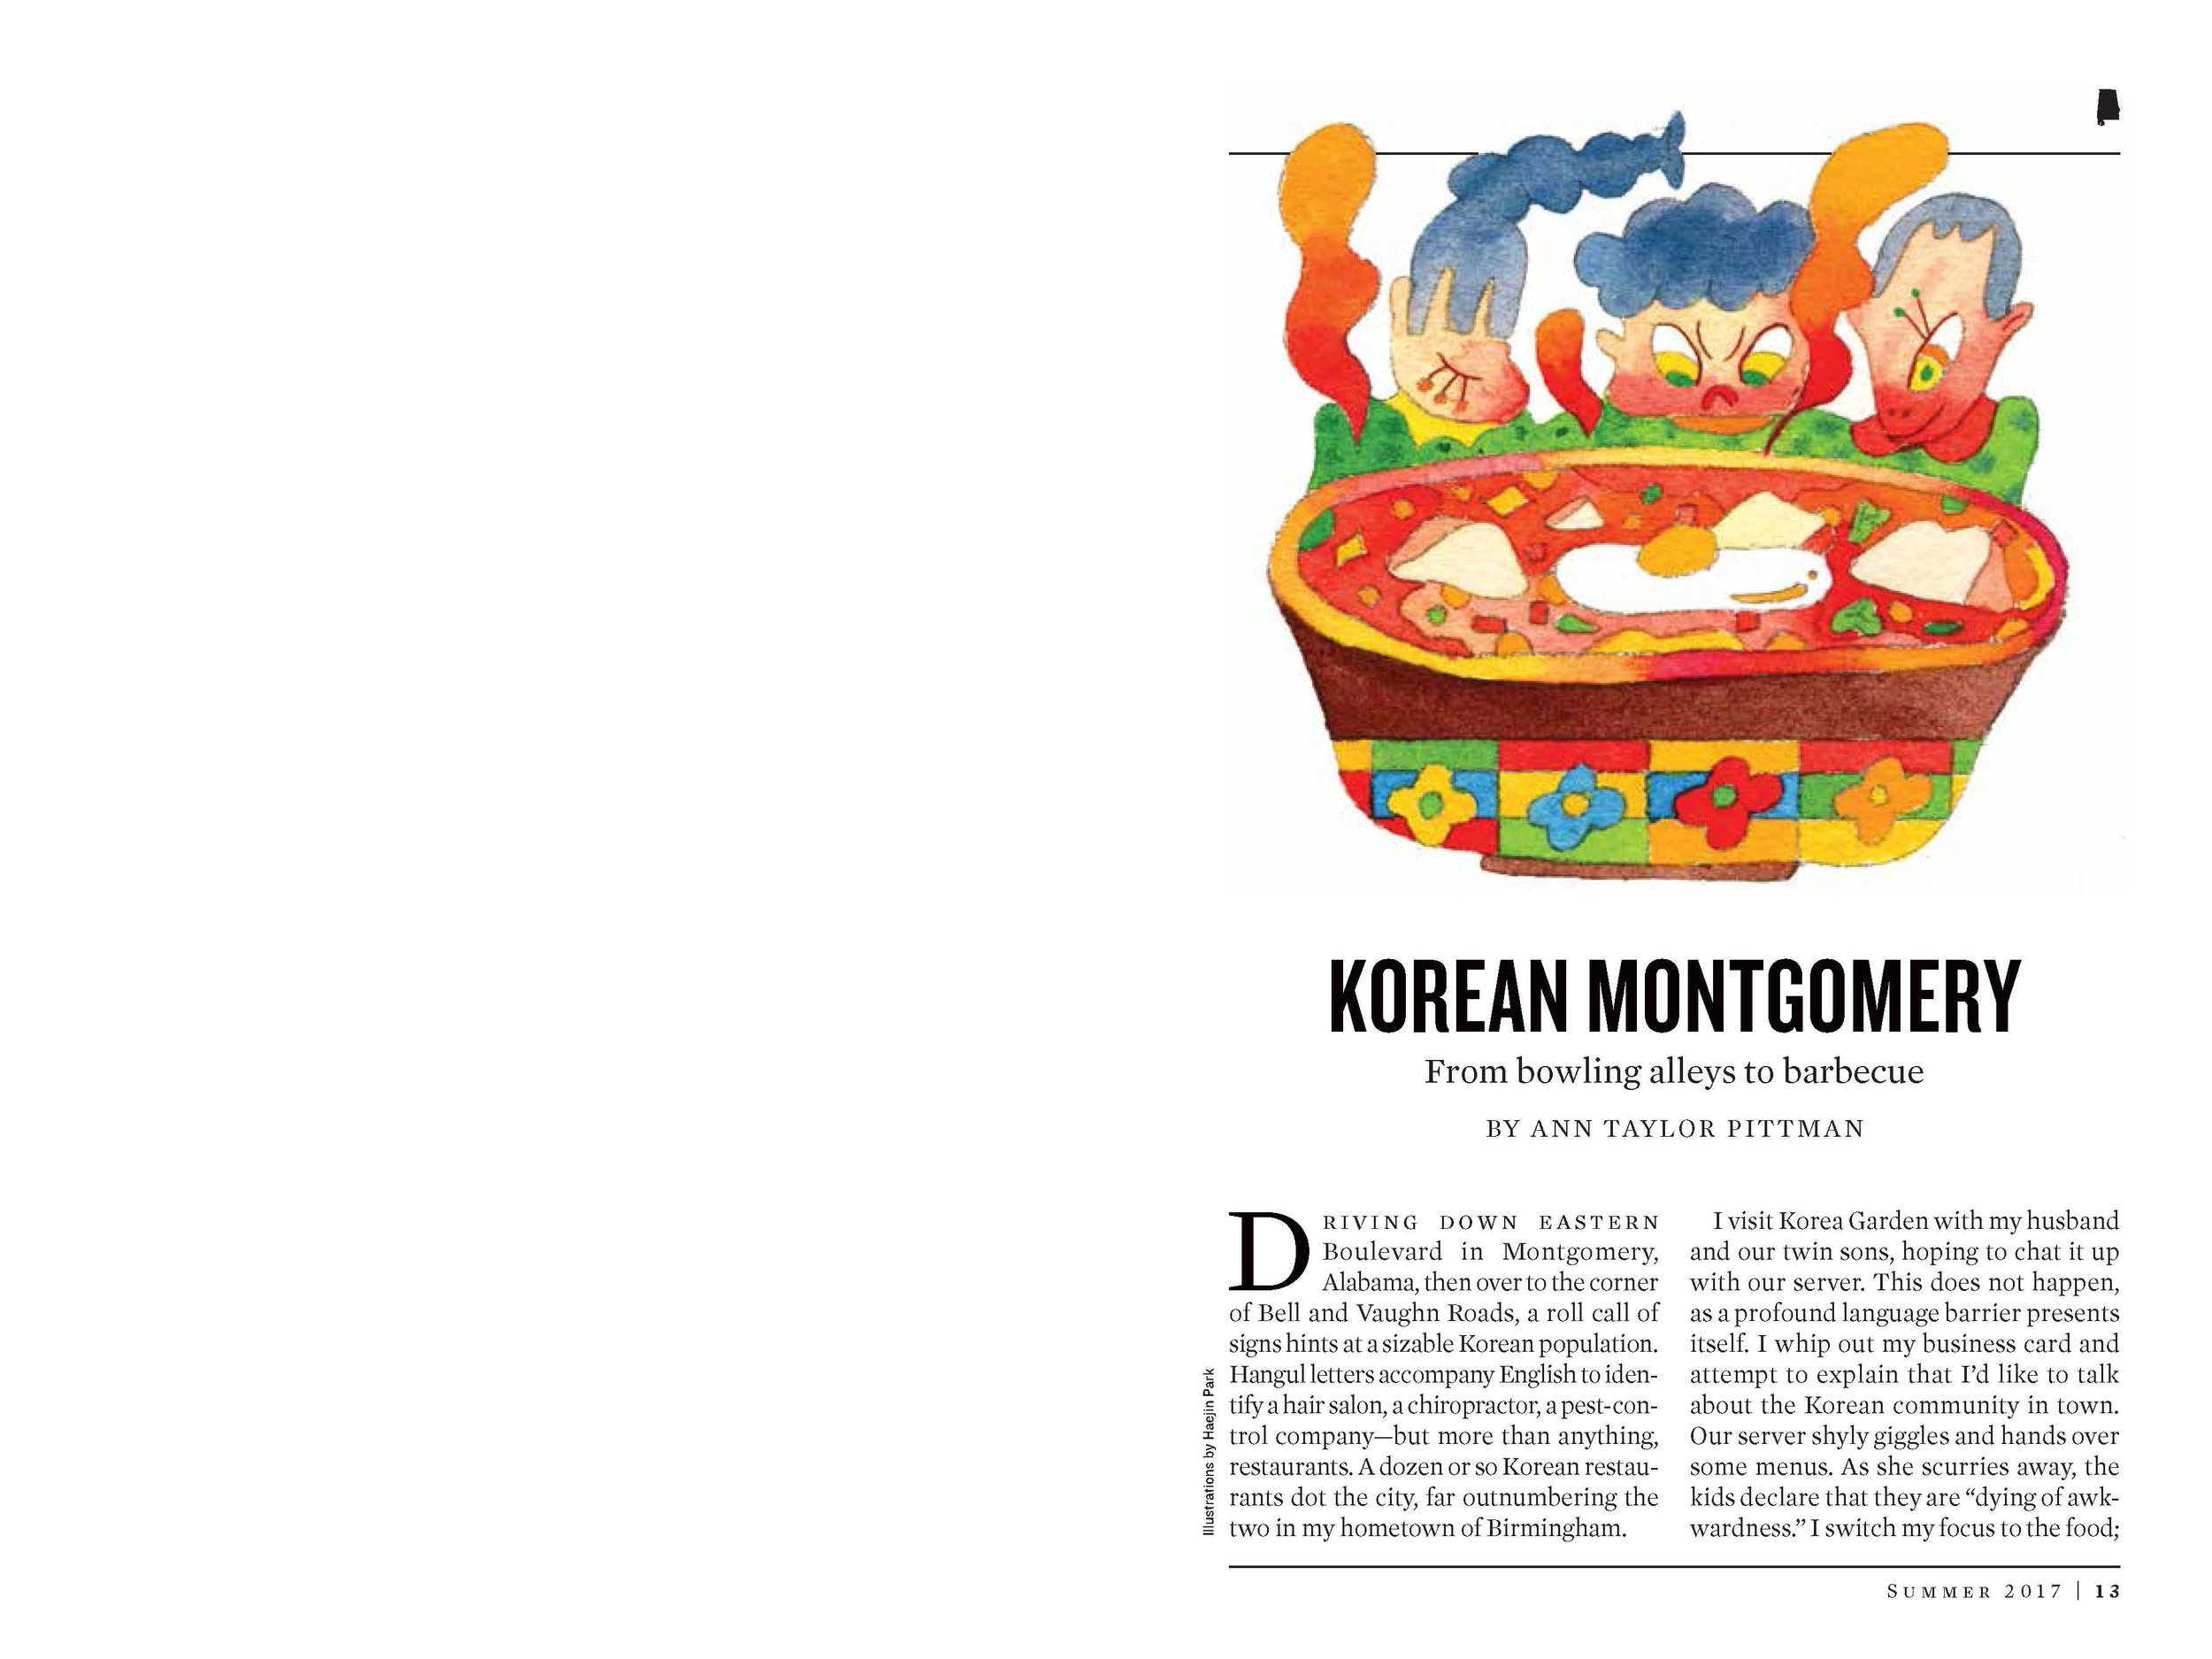 KoreanMontgomery_Page_1.jpg